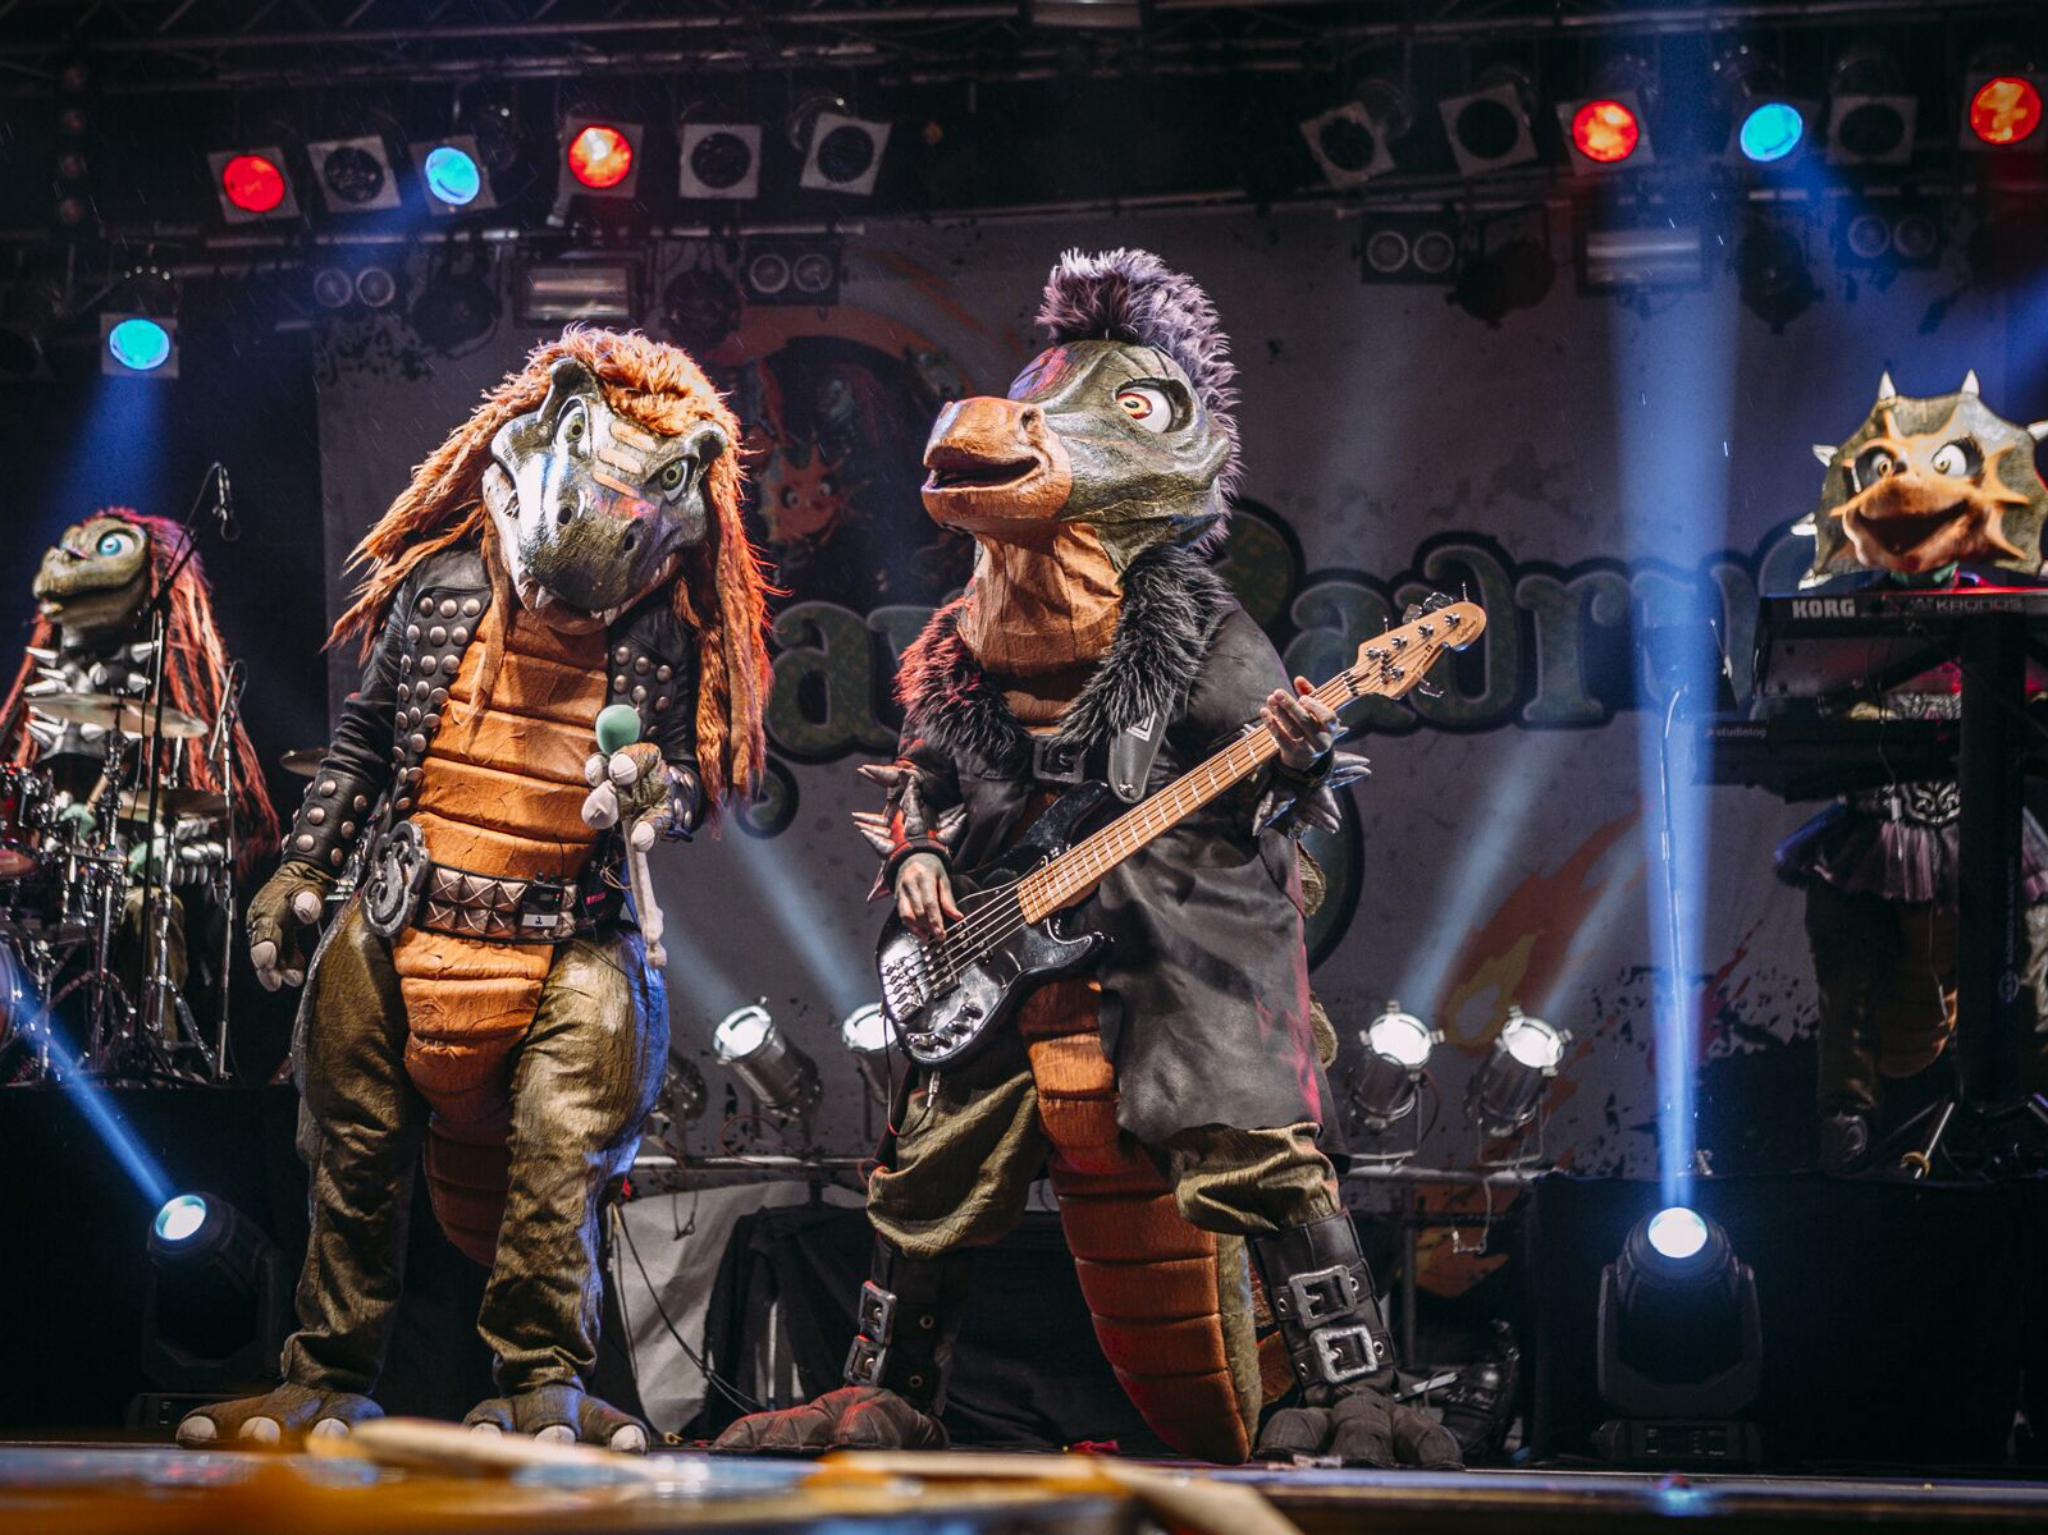 In Dinokostümen Musik machen. Foto: Susanne Müller